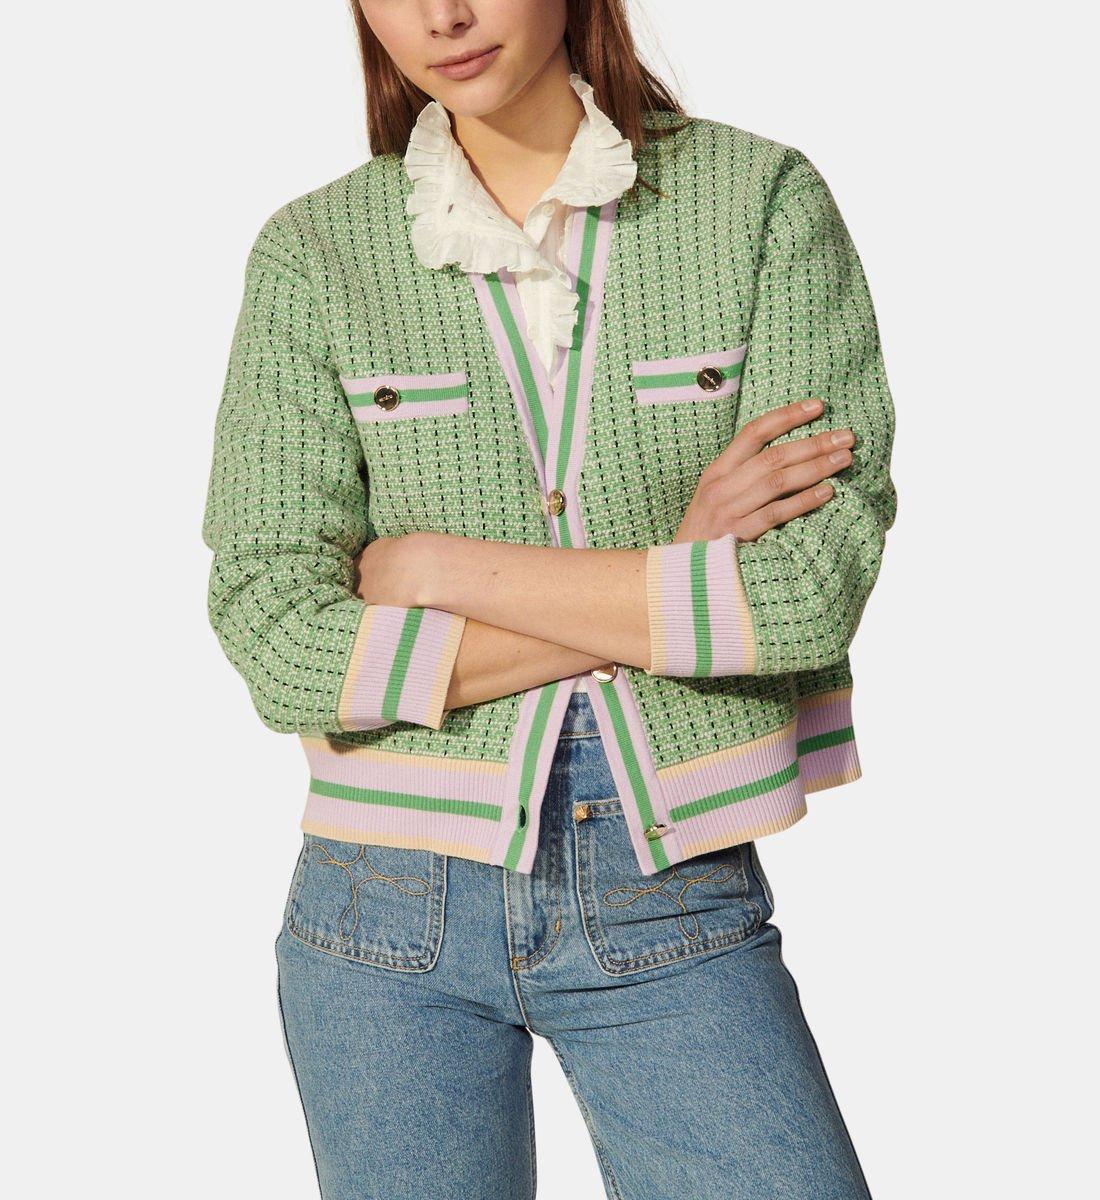 Cardigan droit en tweed de coton, Sandro, 157,50€ au lieu de 225€.